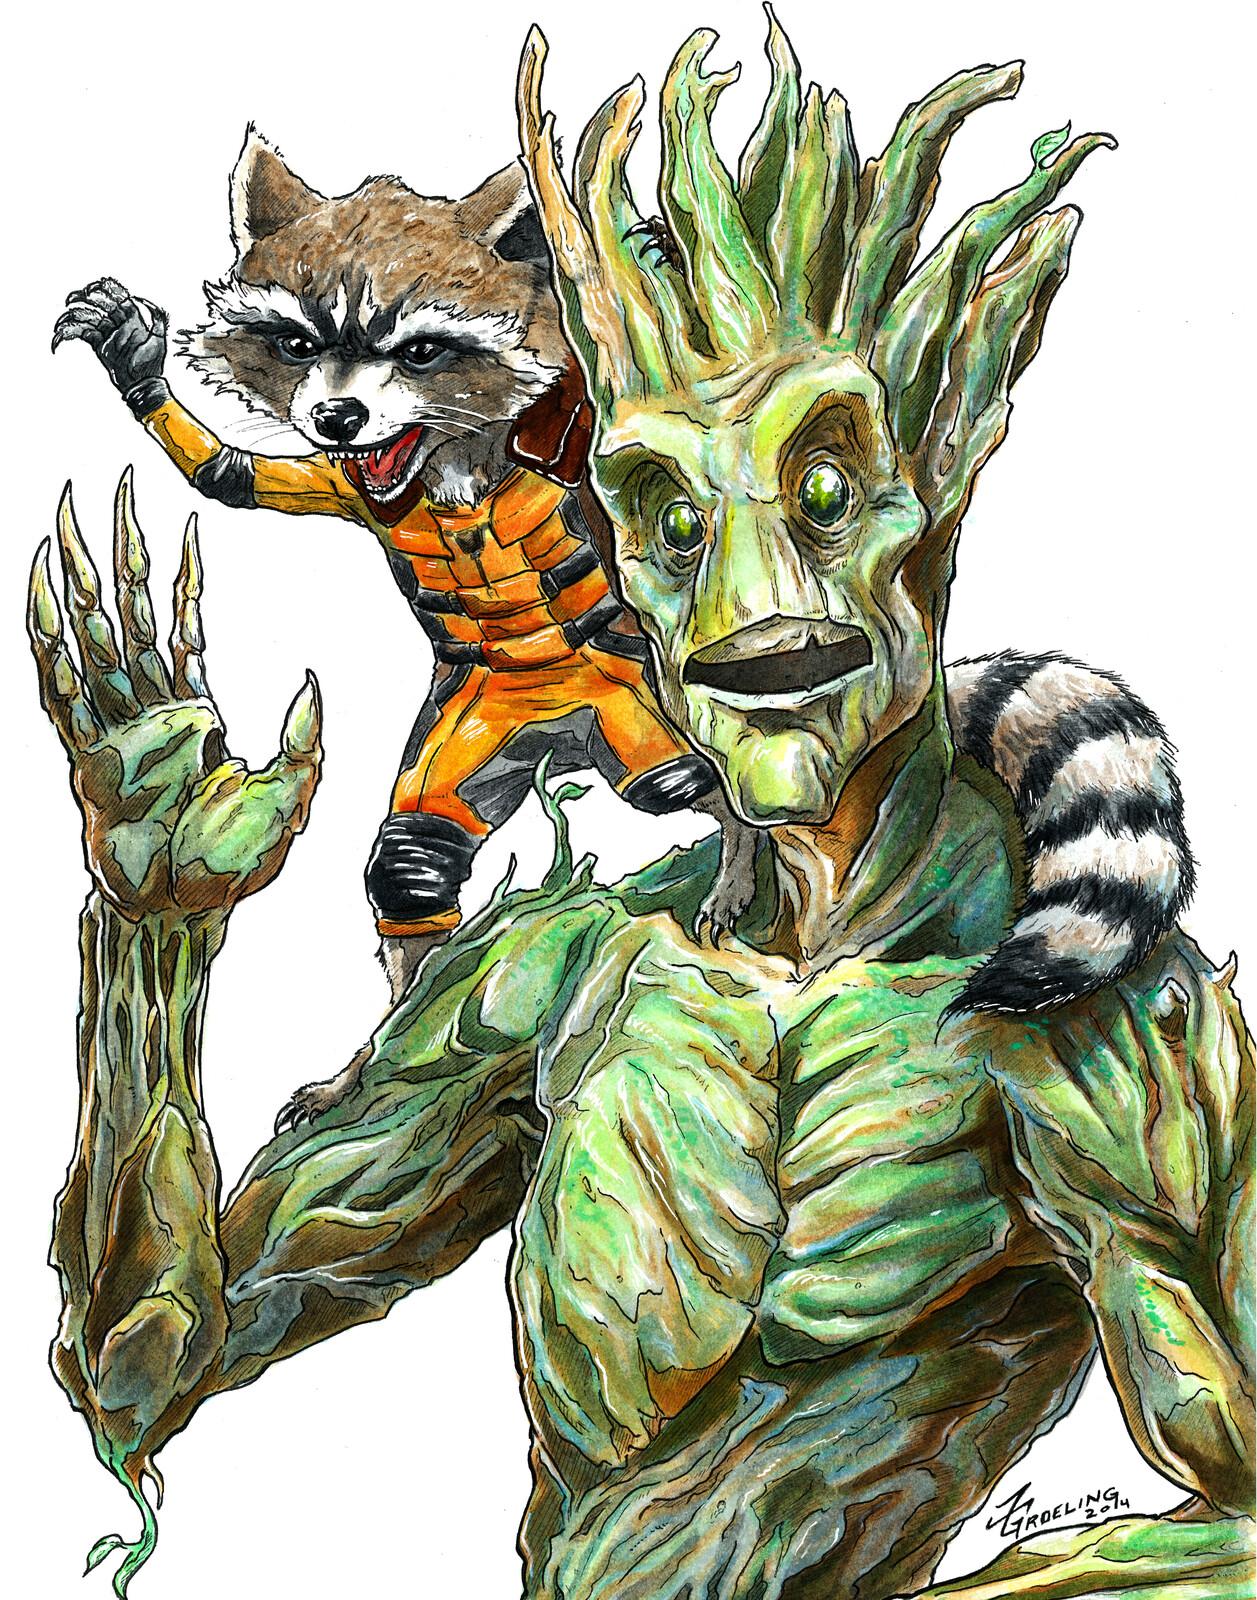 Guardians of the Galaxy - Marvel Comics